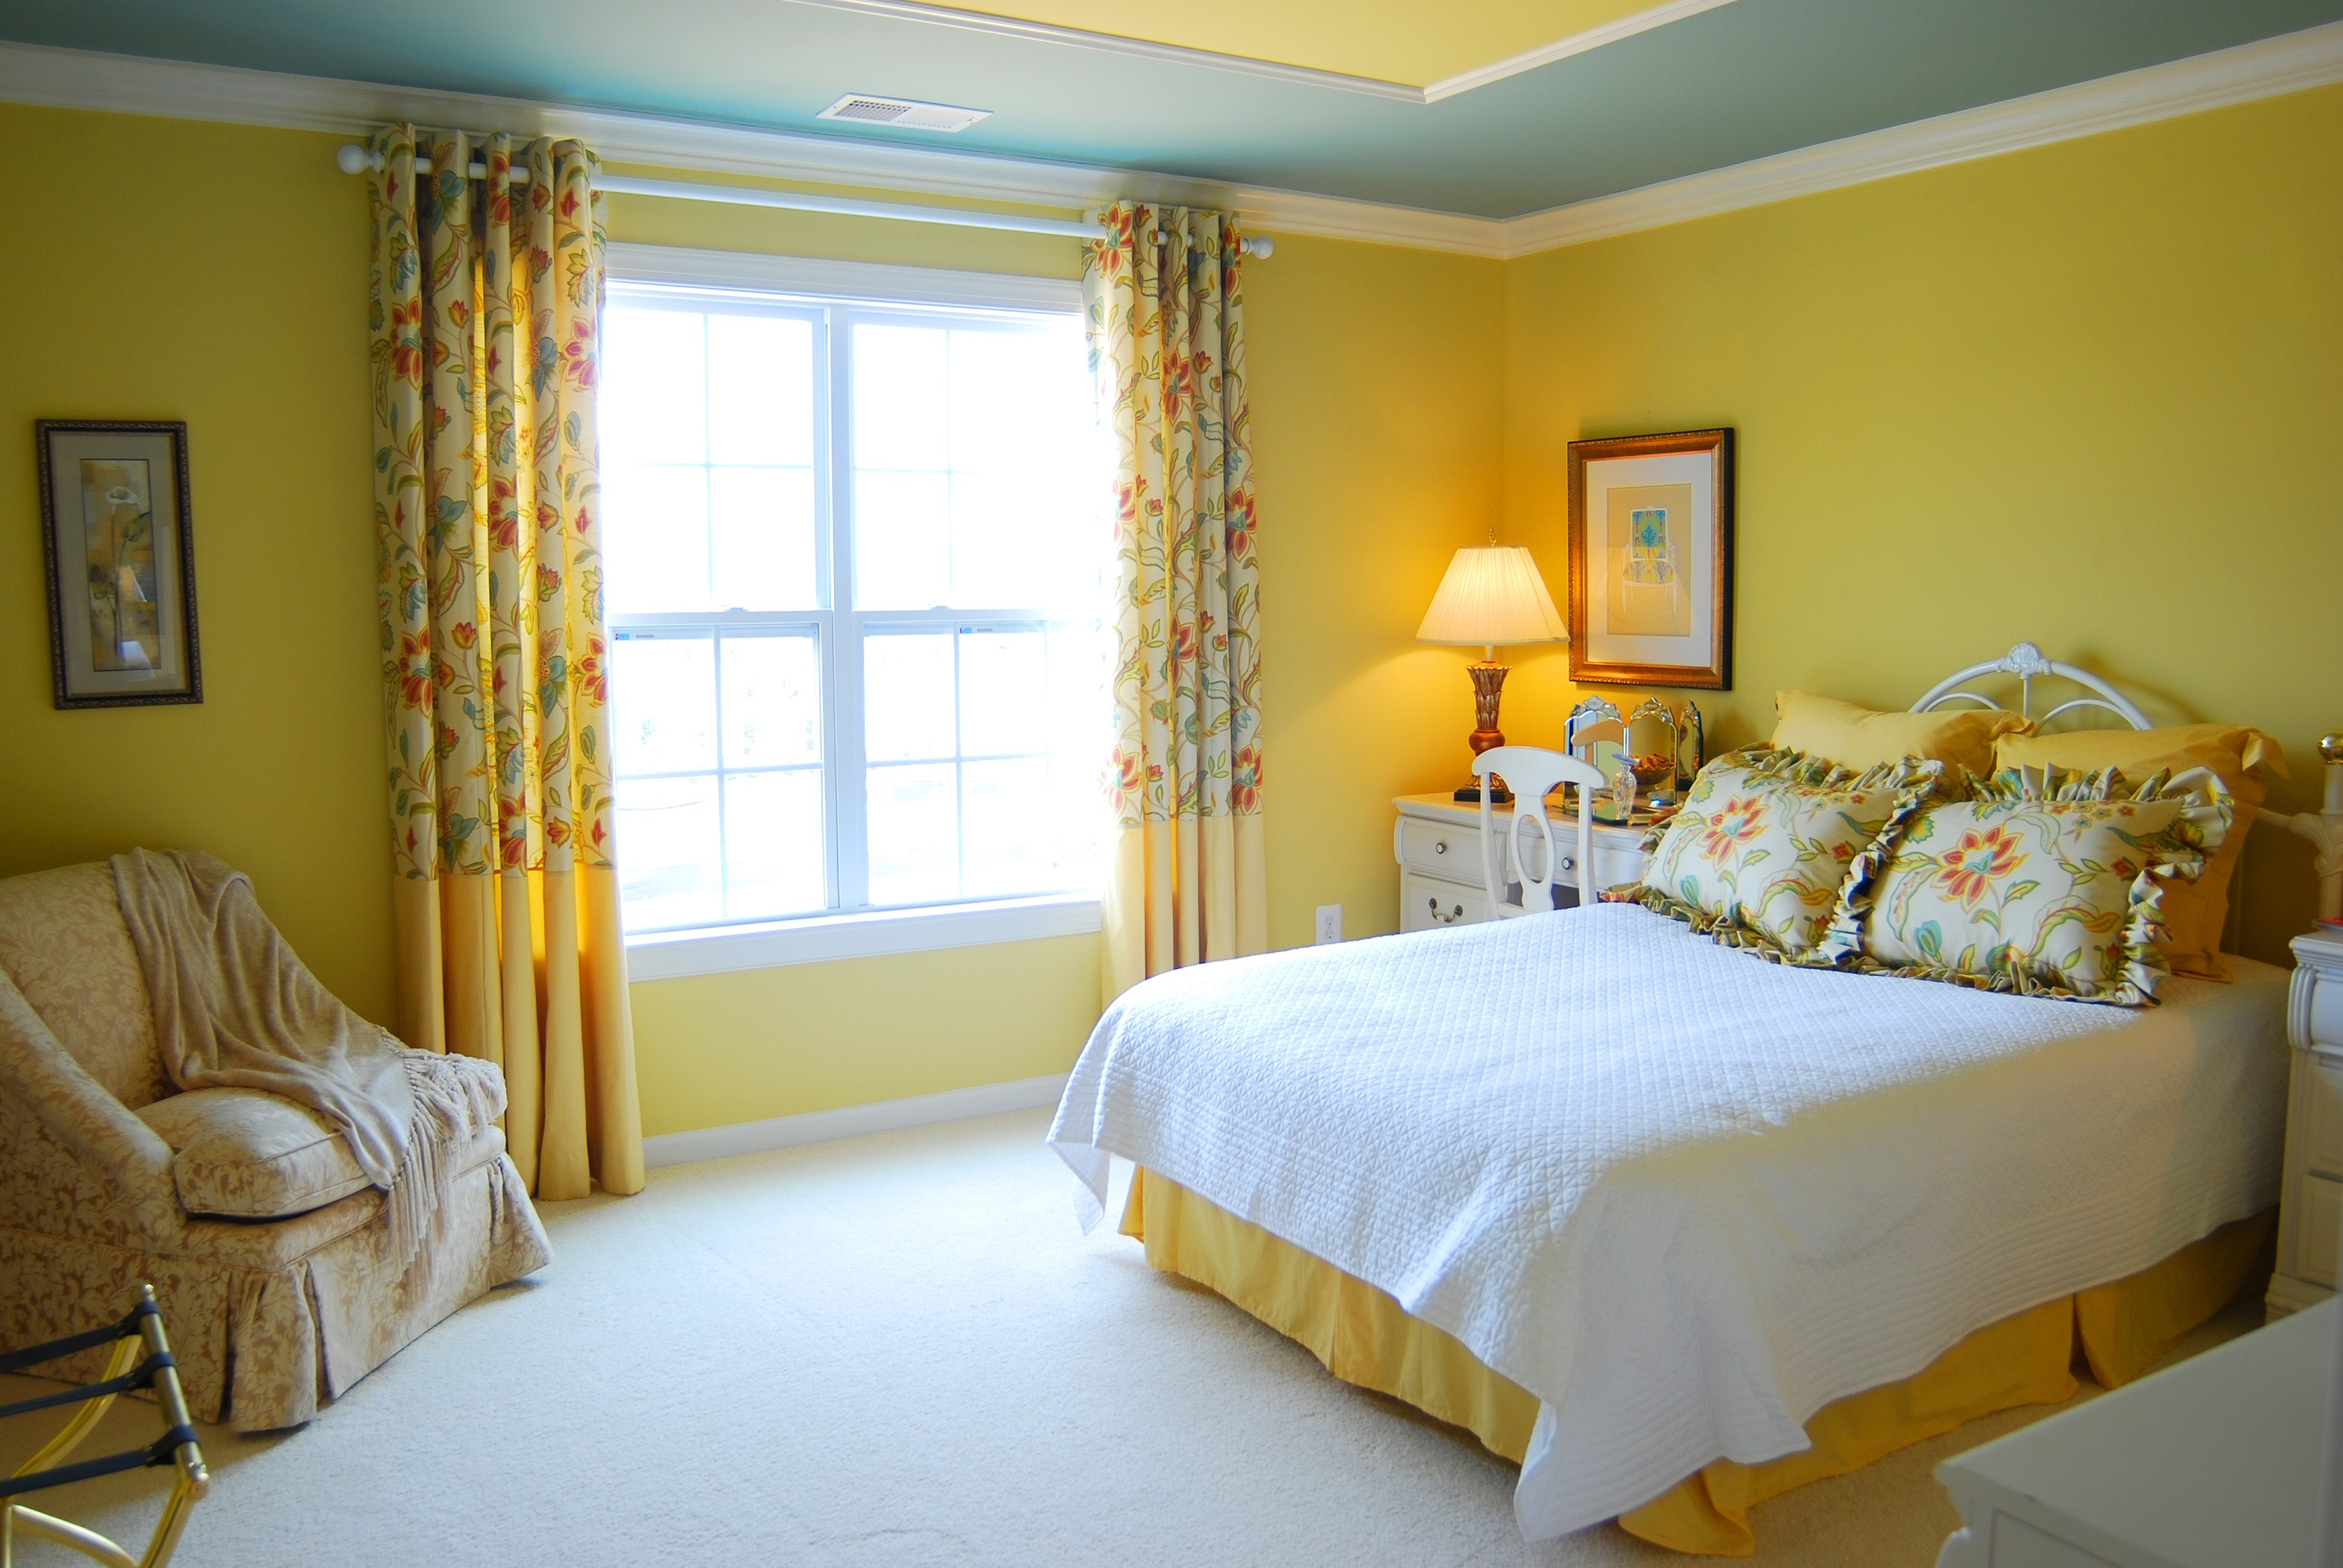 Olive Yellow Bedroom Decorating Ideas Viahouse Com